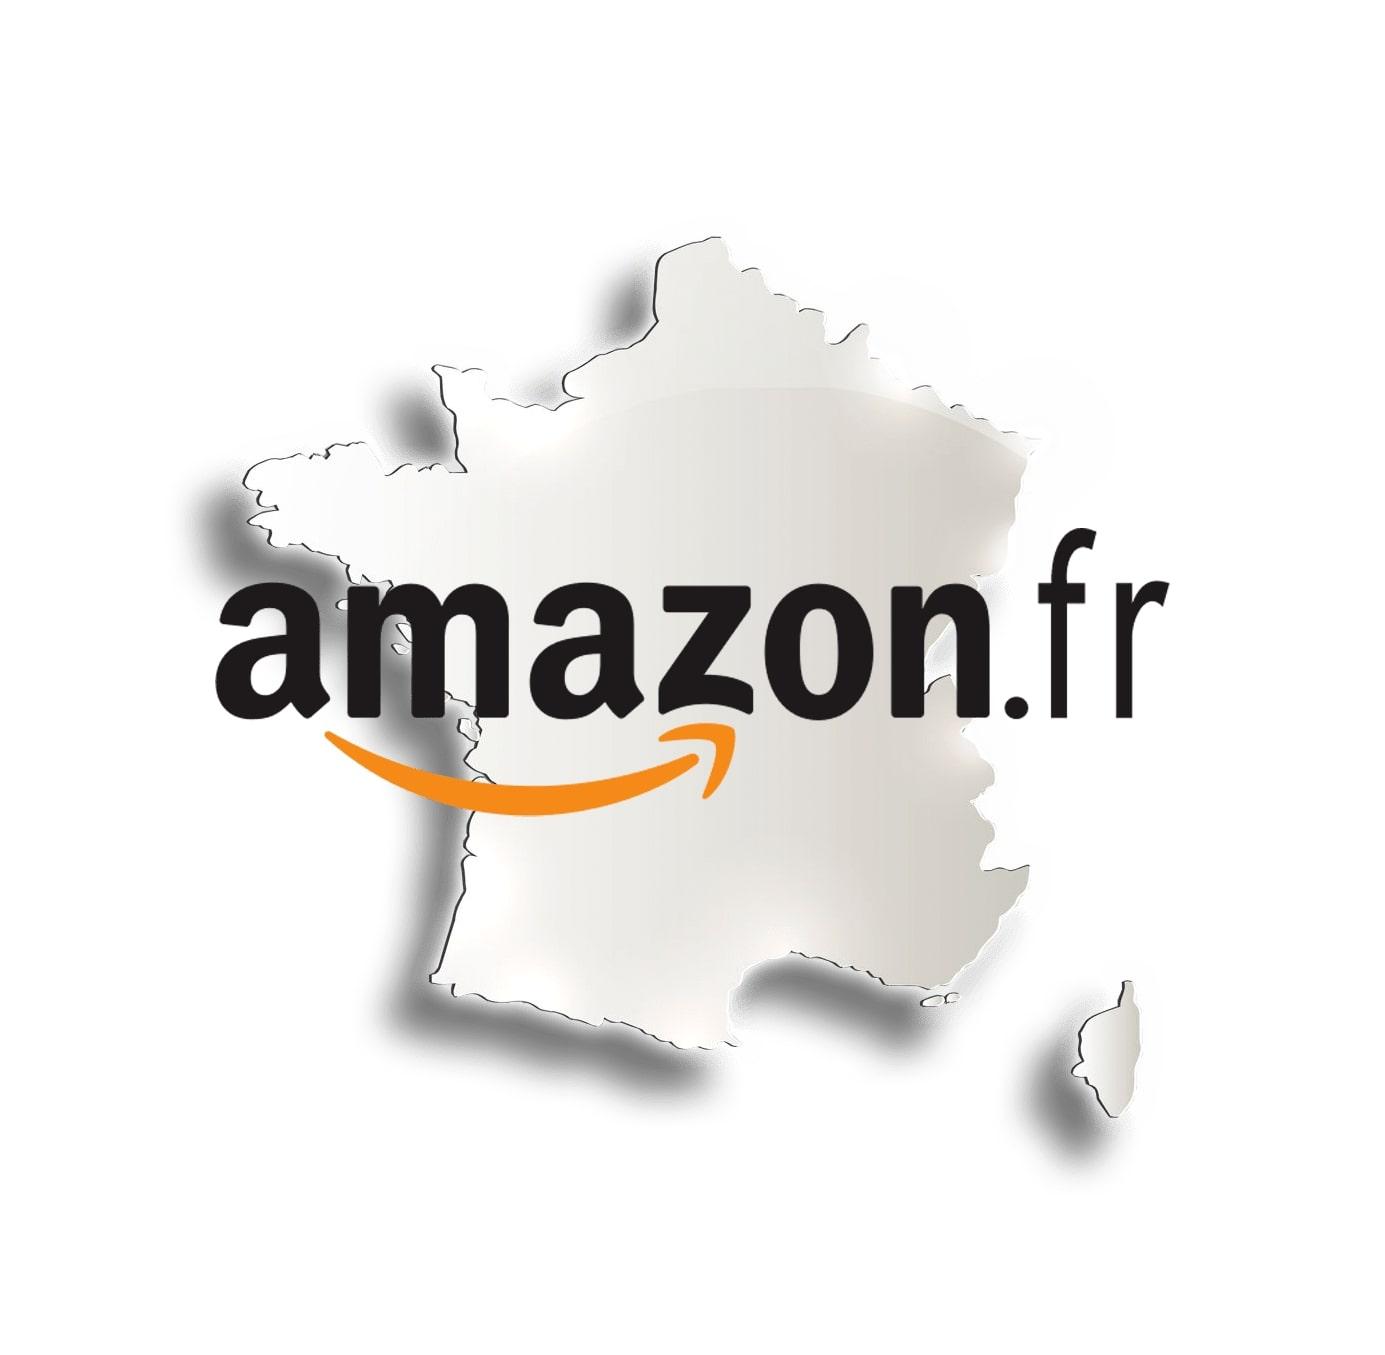 amazon.fr-freigestellt-min